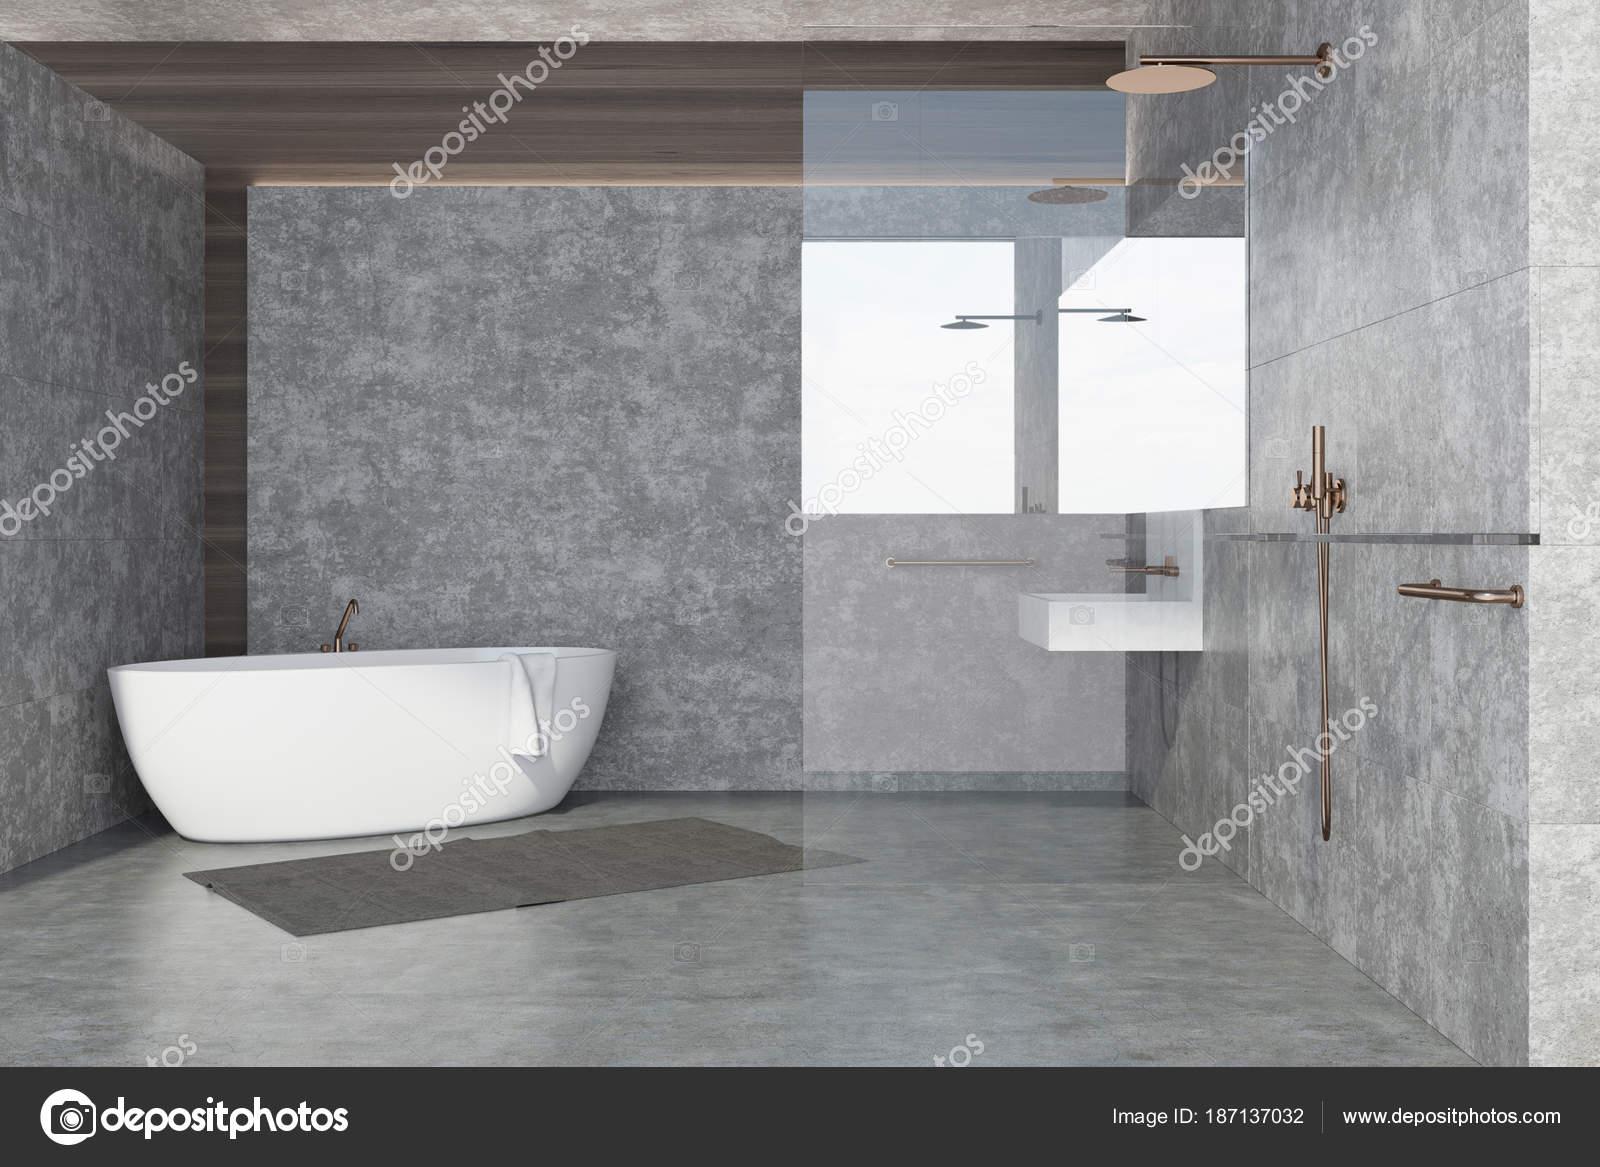 Beton Muur Badkamer : Betonnen muur badkamer interieur witte tub u stockfoto